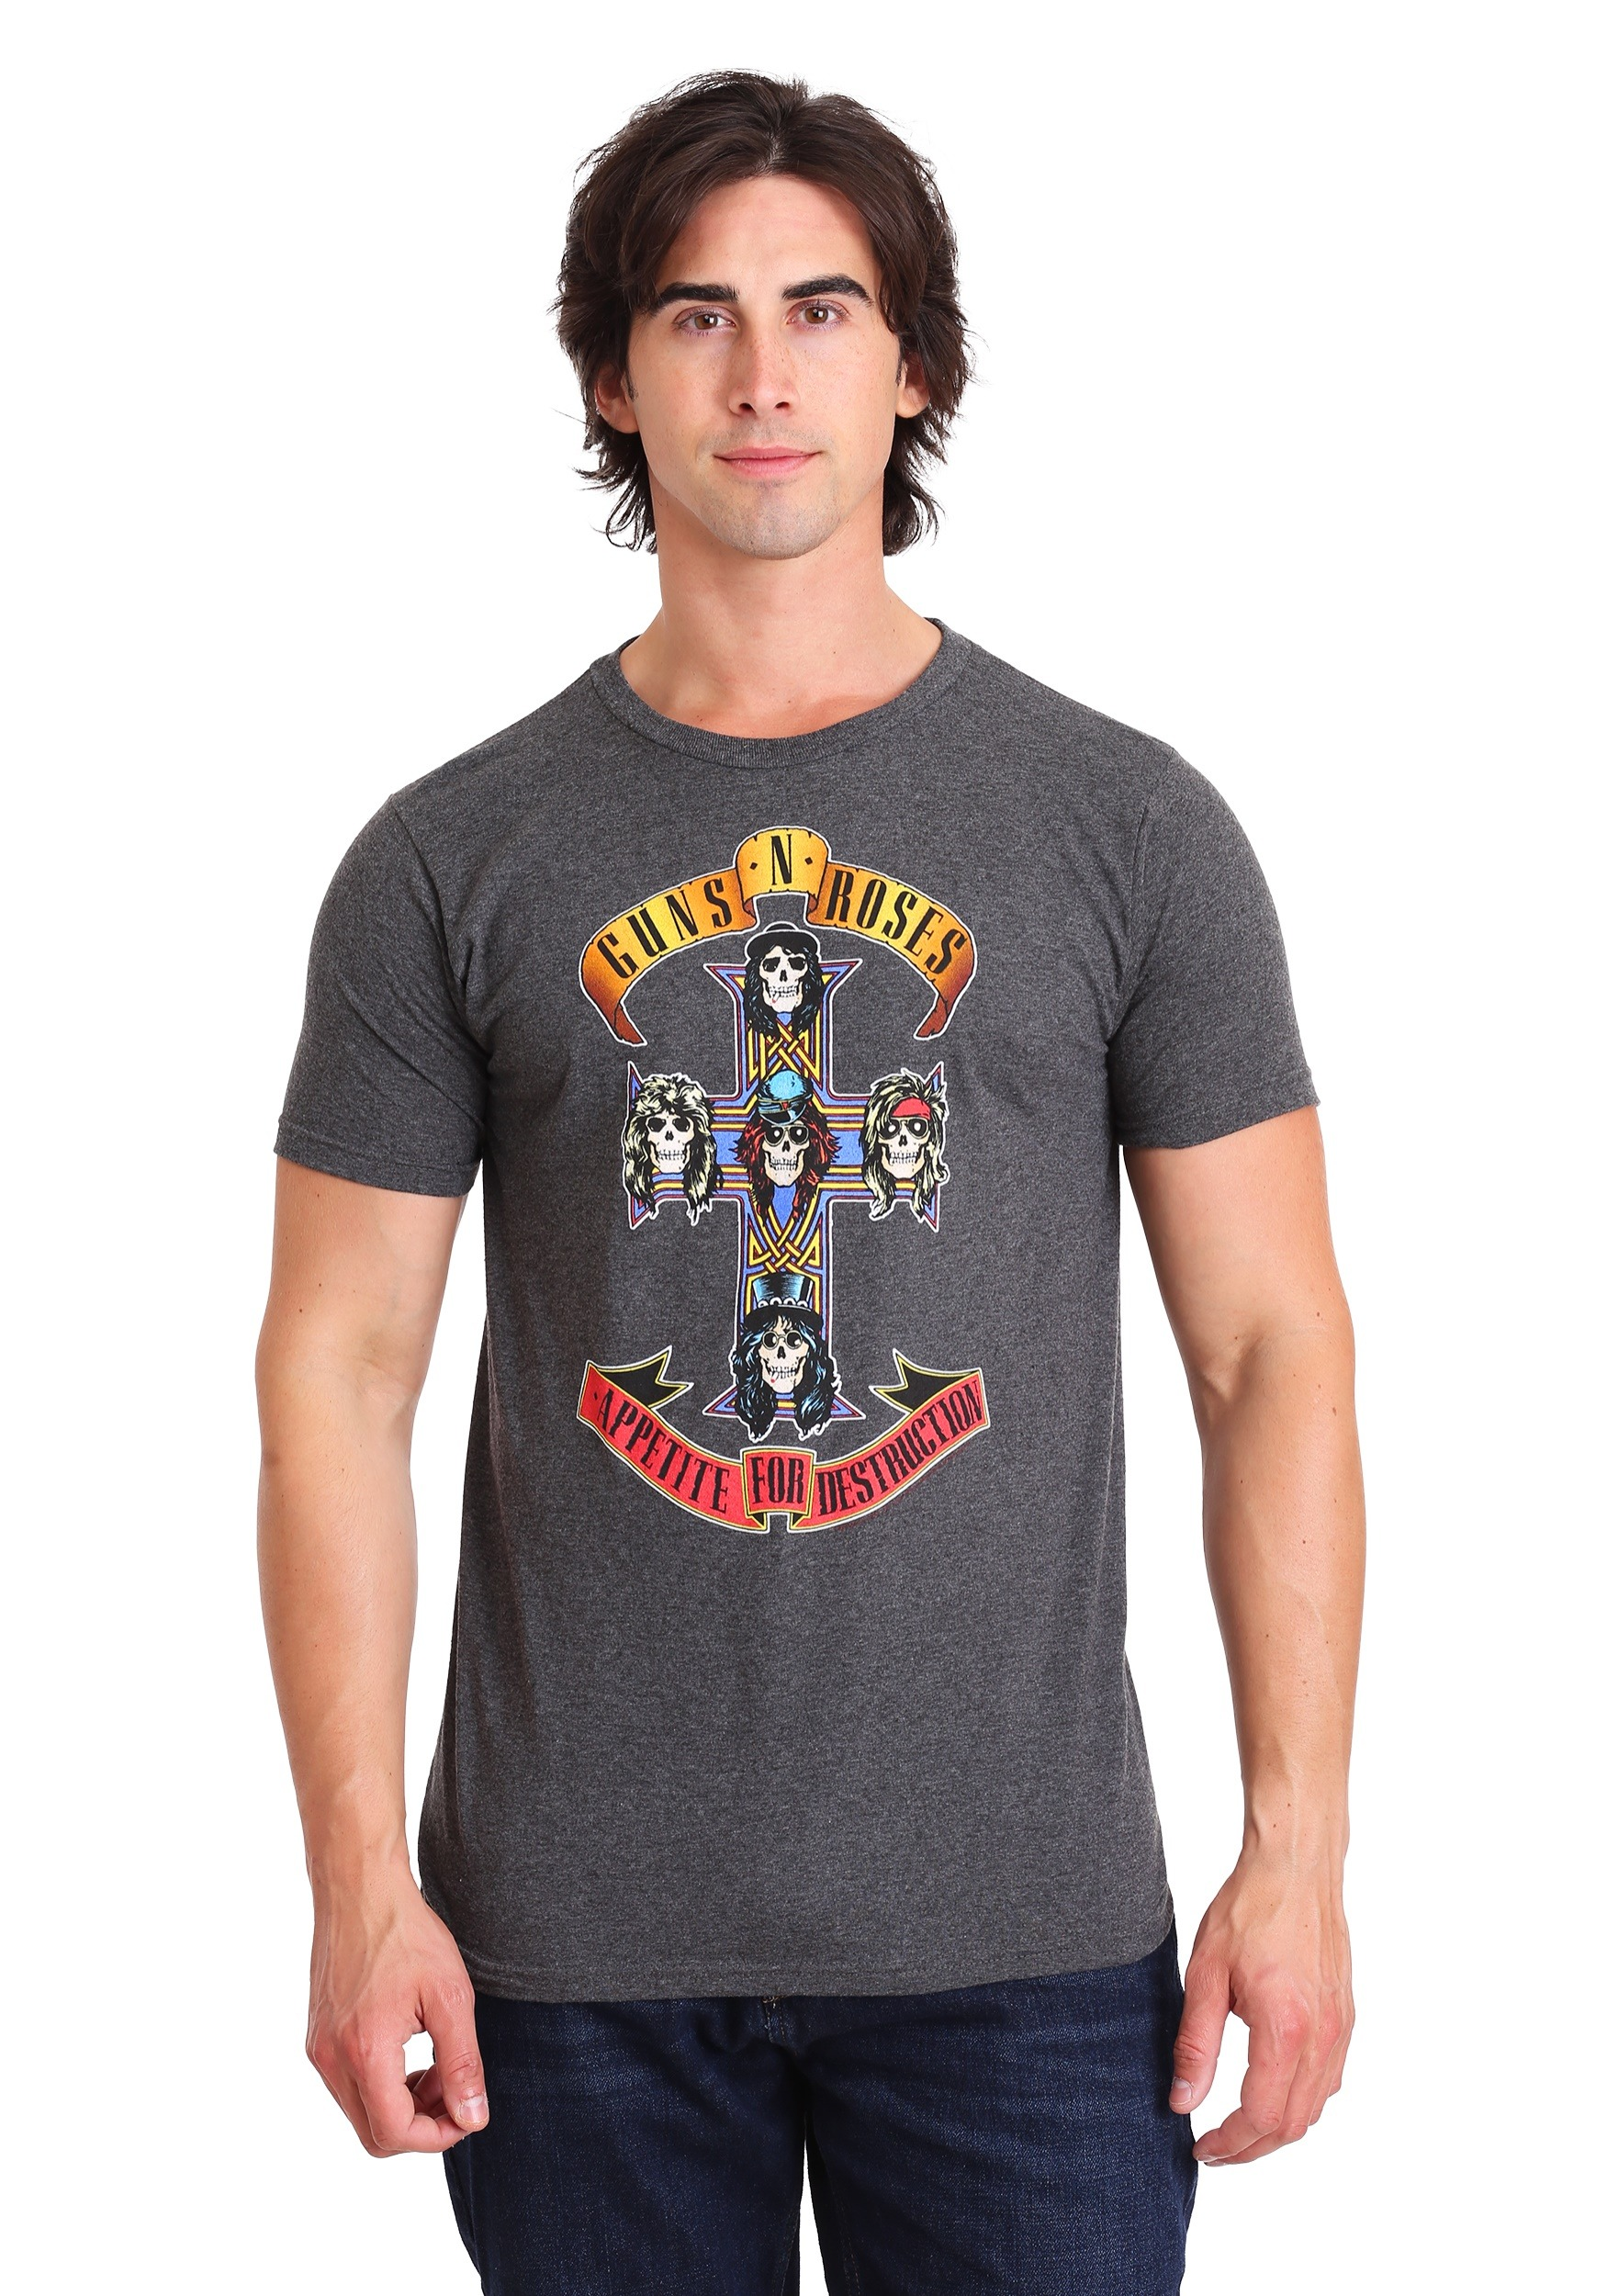 Guns N Roses Appetite for Destruction Adult T-Shirt